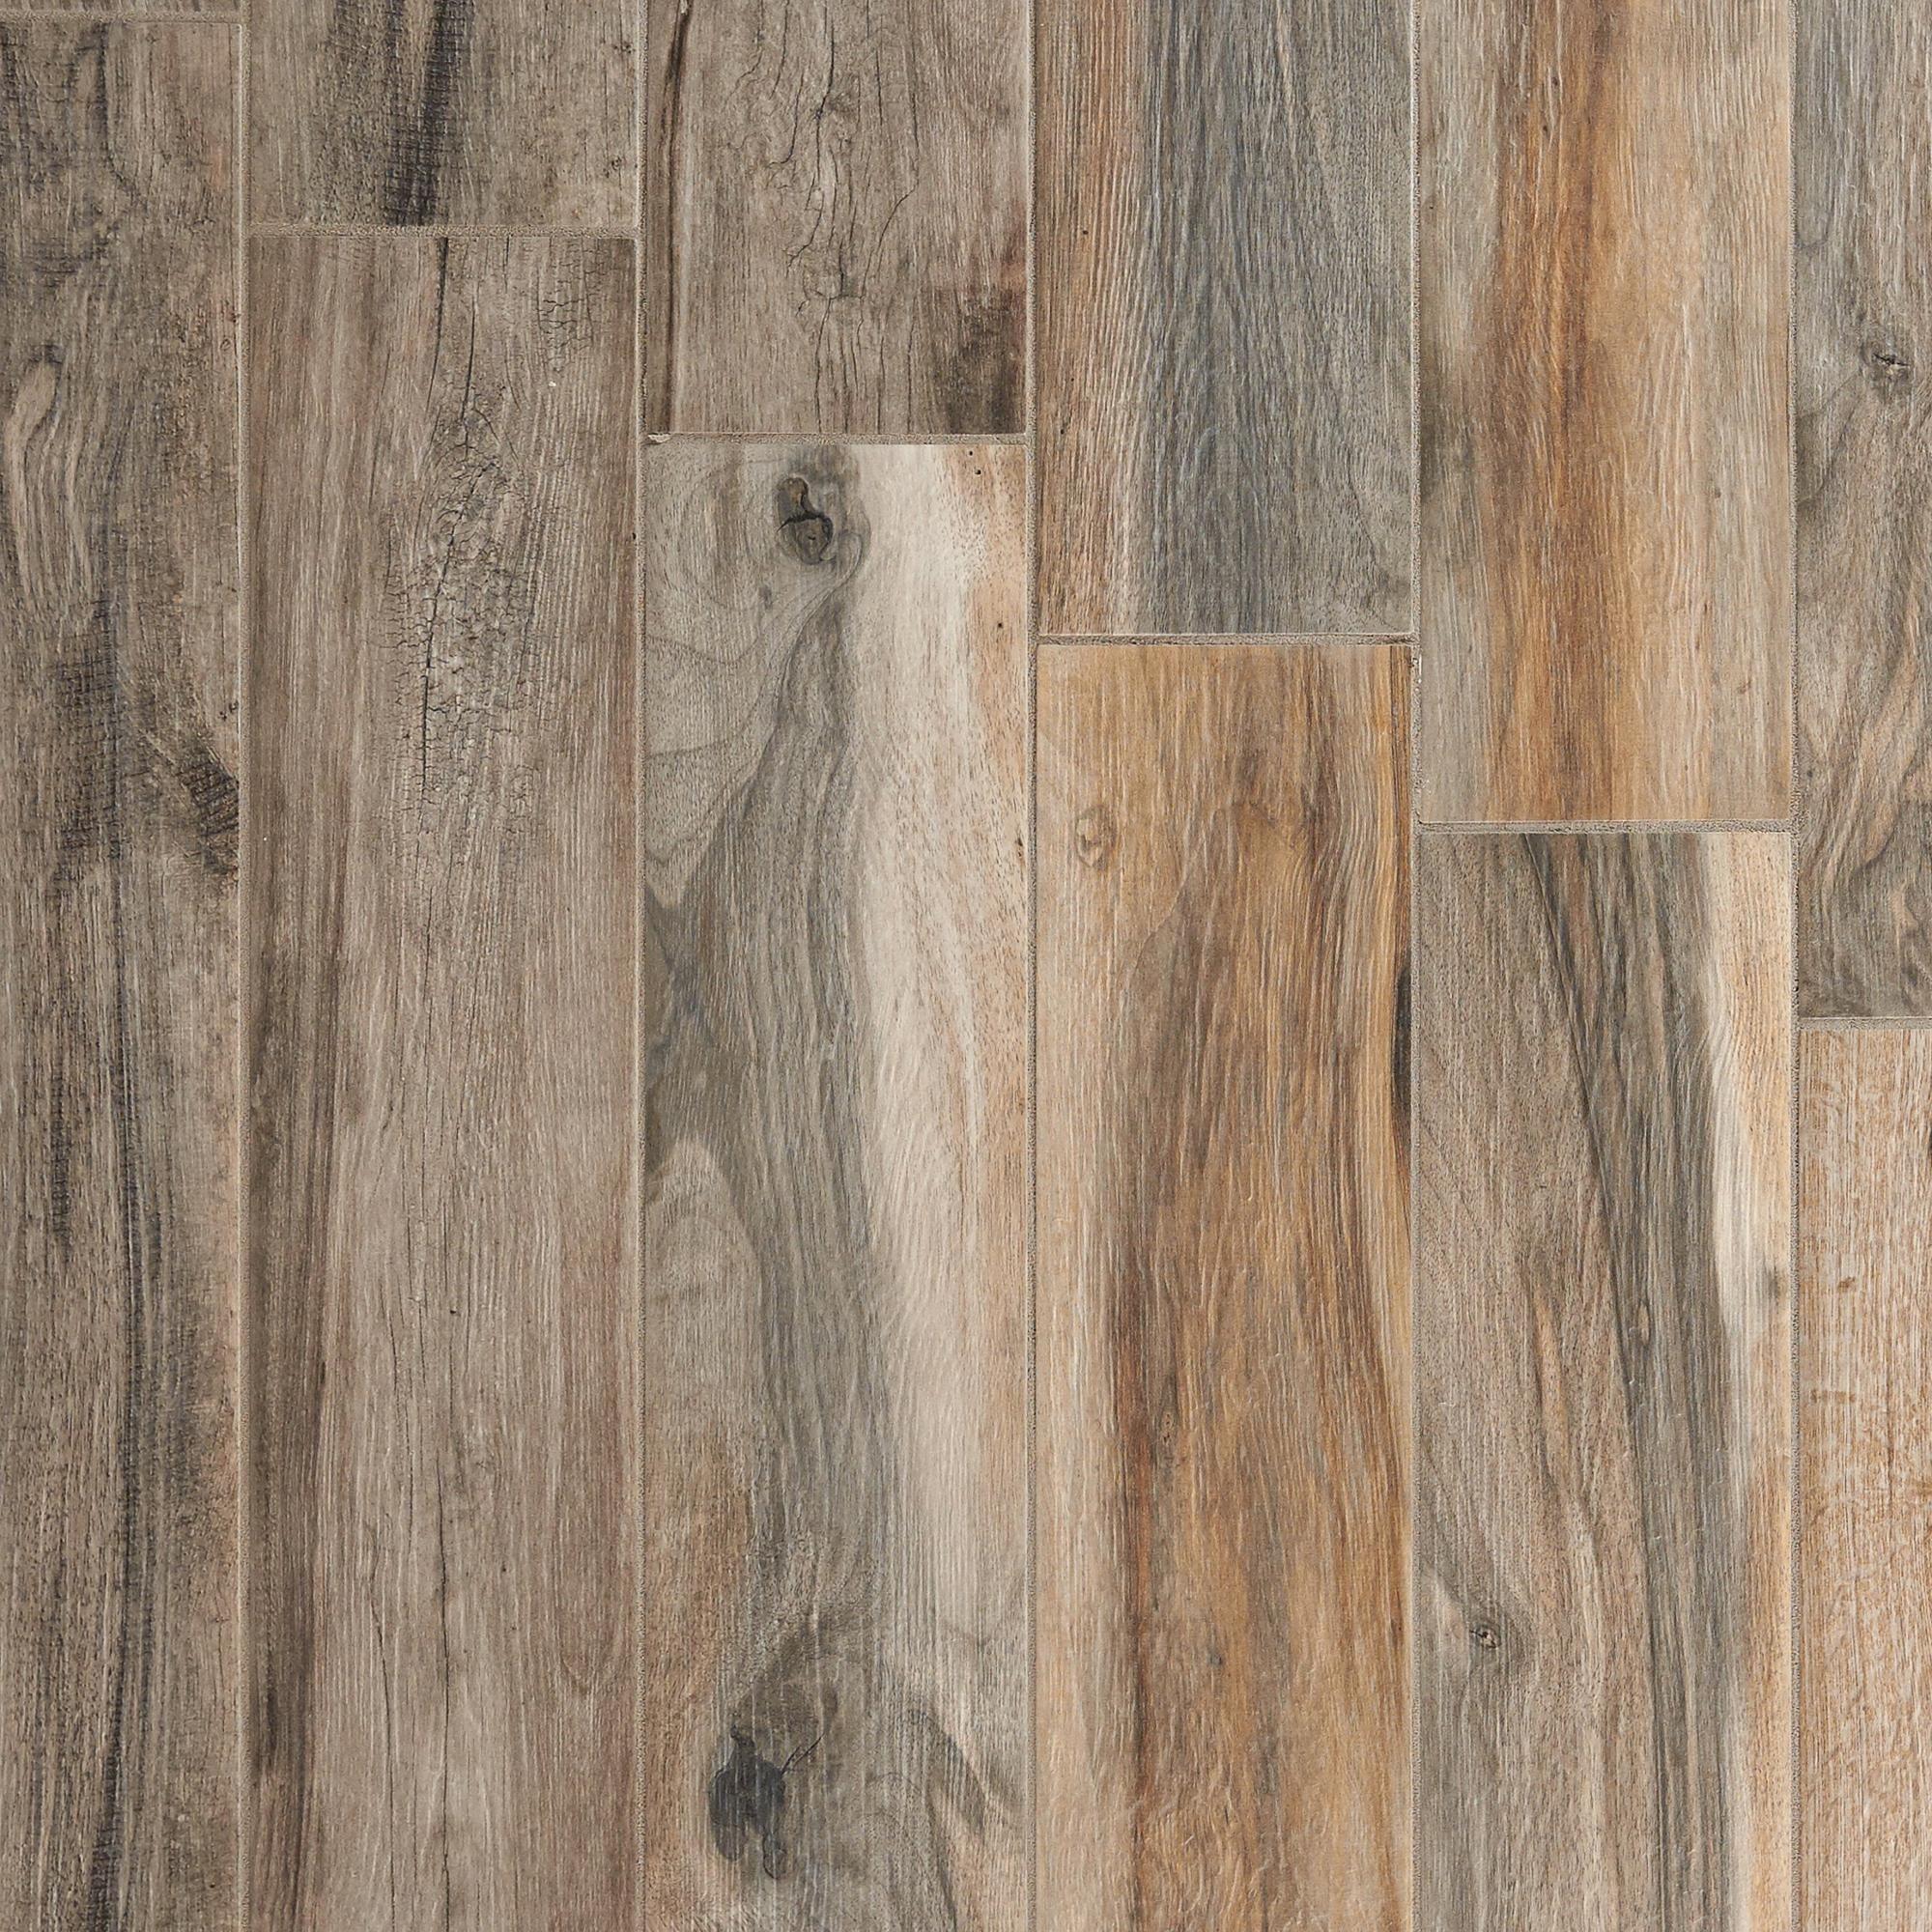 Soft Ash Wood Plank Porcelain Tile Floor & Decor